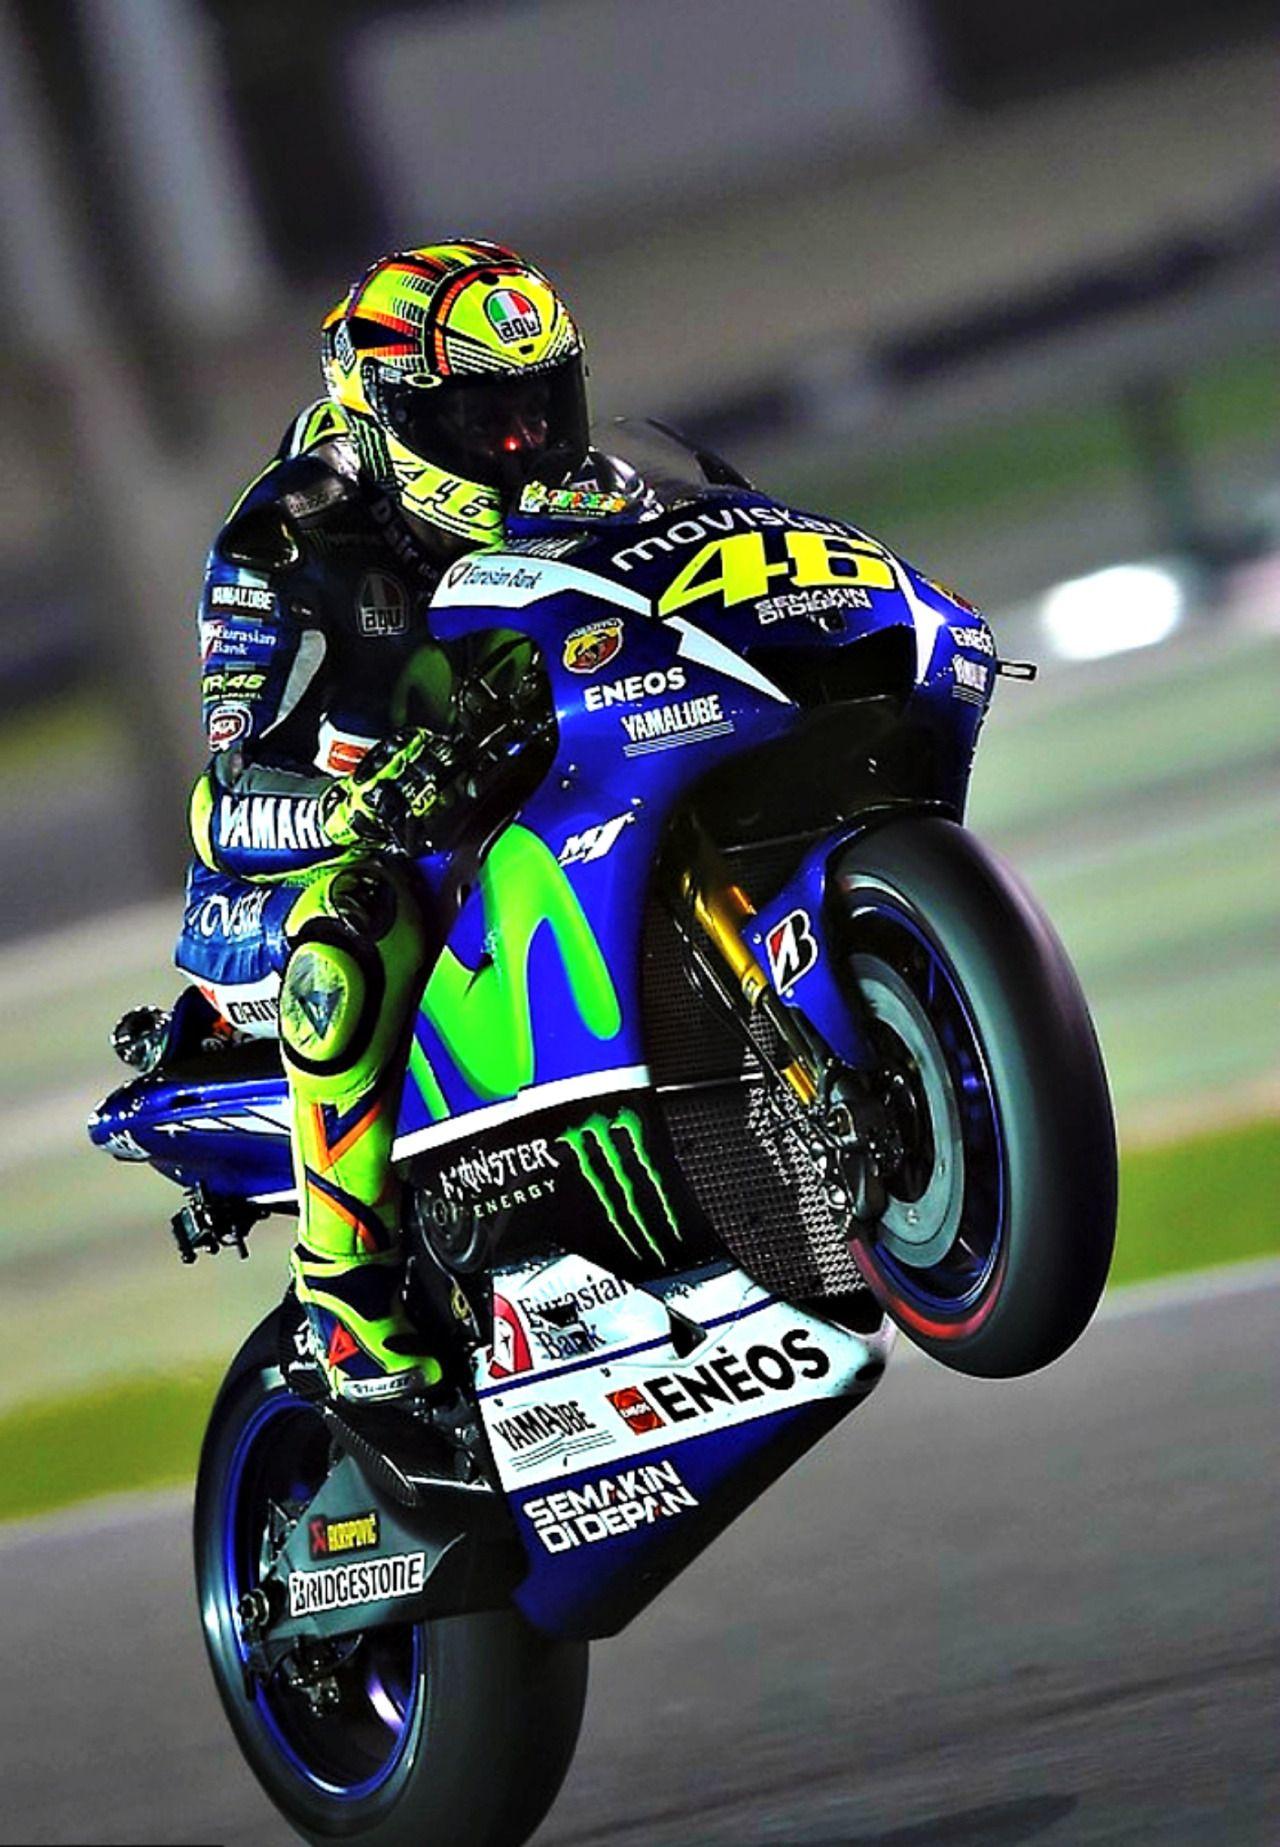 Valentino Rossi Motorcycles Pinterest – Valentino Rossi Birthday Card